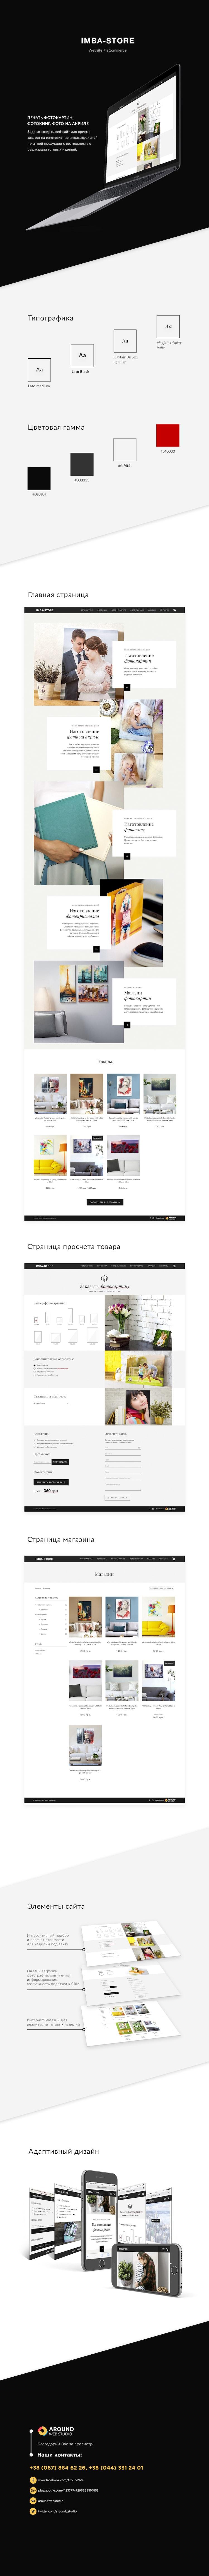 Разработка сайта и интернет-магазина для Imba-store